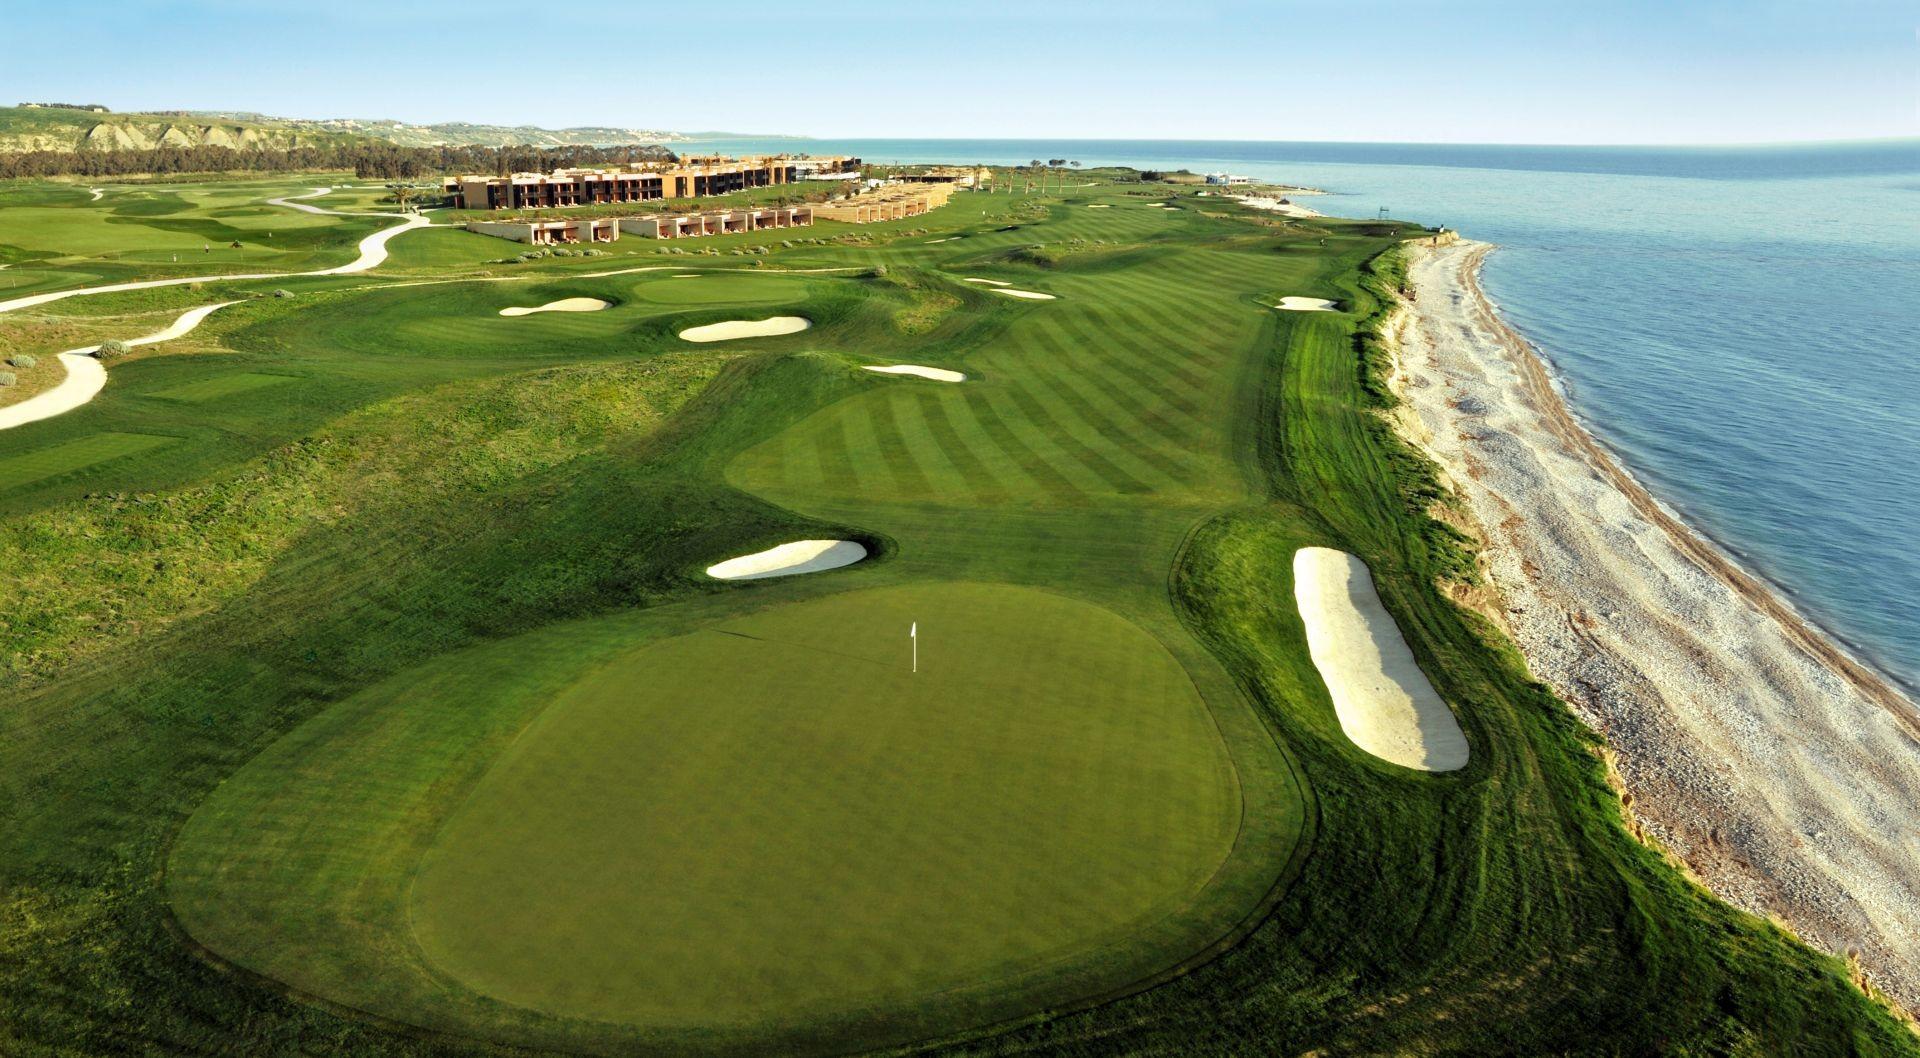 Verdura Golf